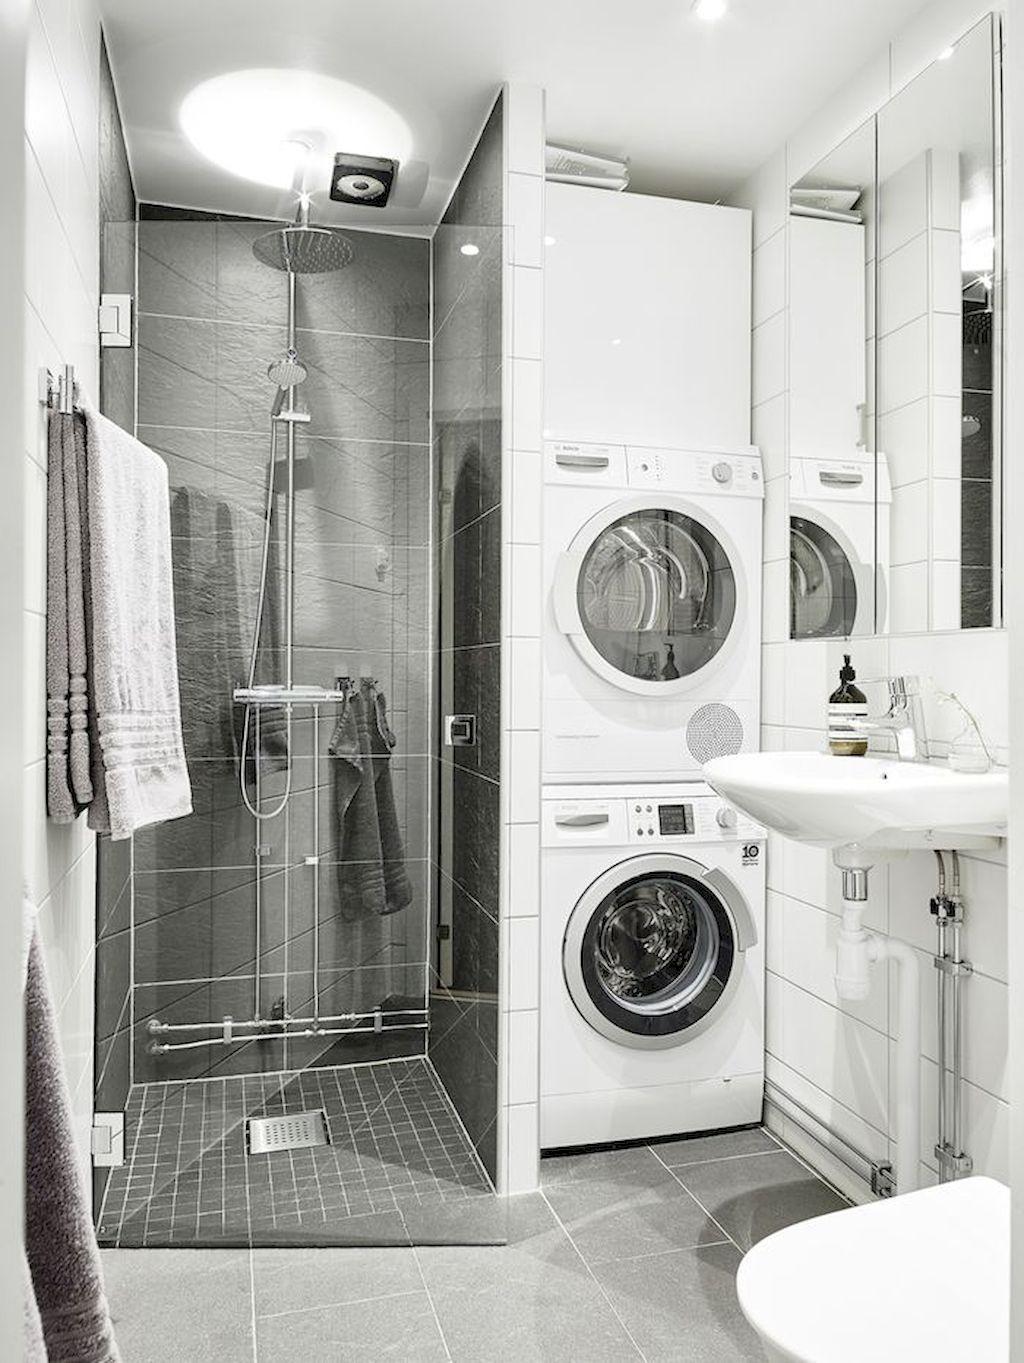 70 Clever Tiny House Bathroom Shower With Tub Ideas   ArchiteSpace